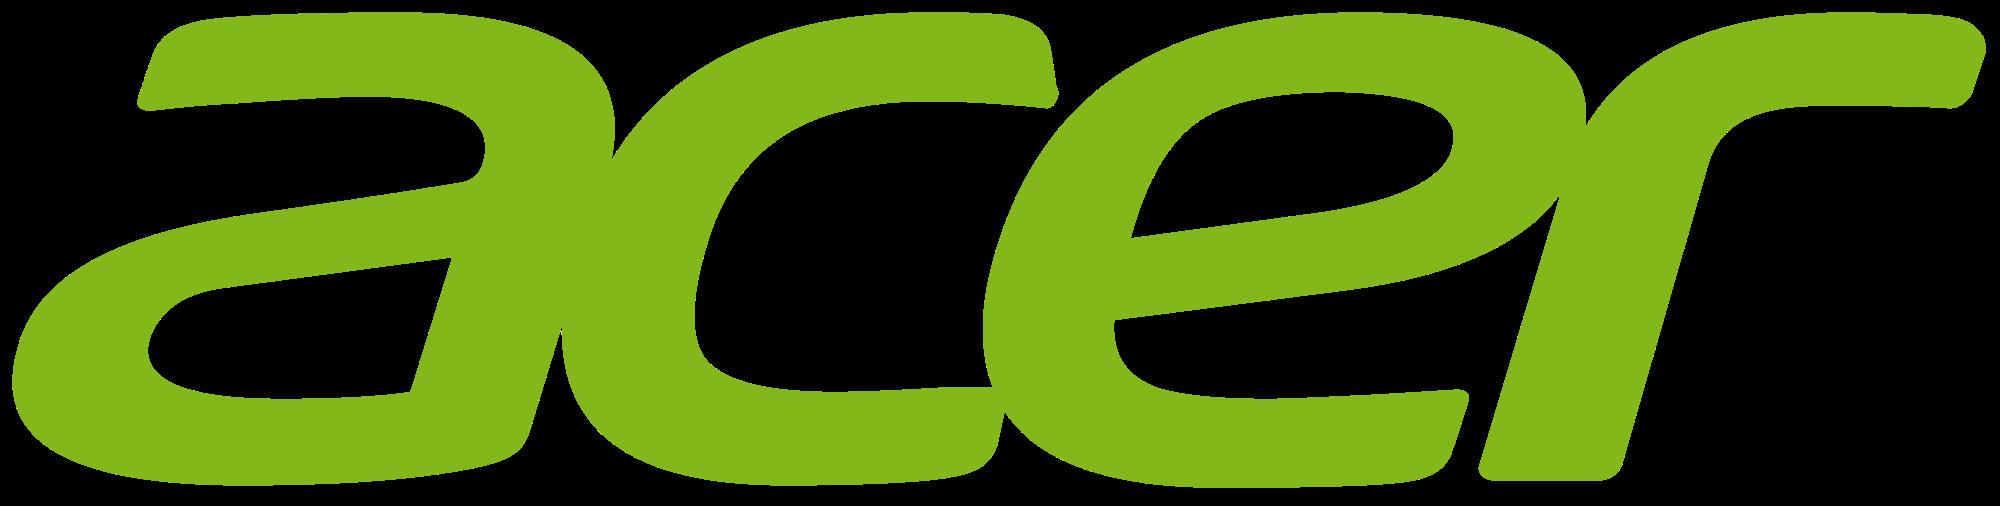 Acer BUMPER CASE obal na Iconie One 10 (B3-A50) čirý